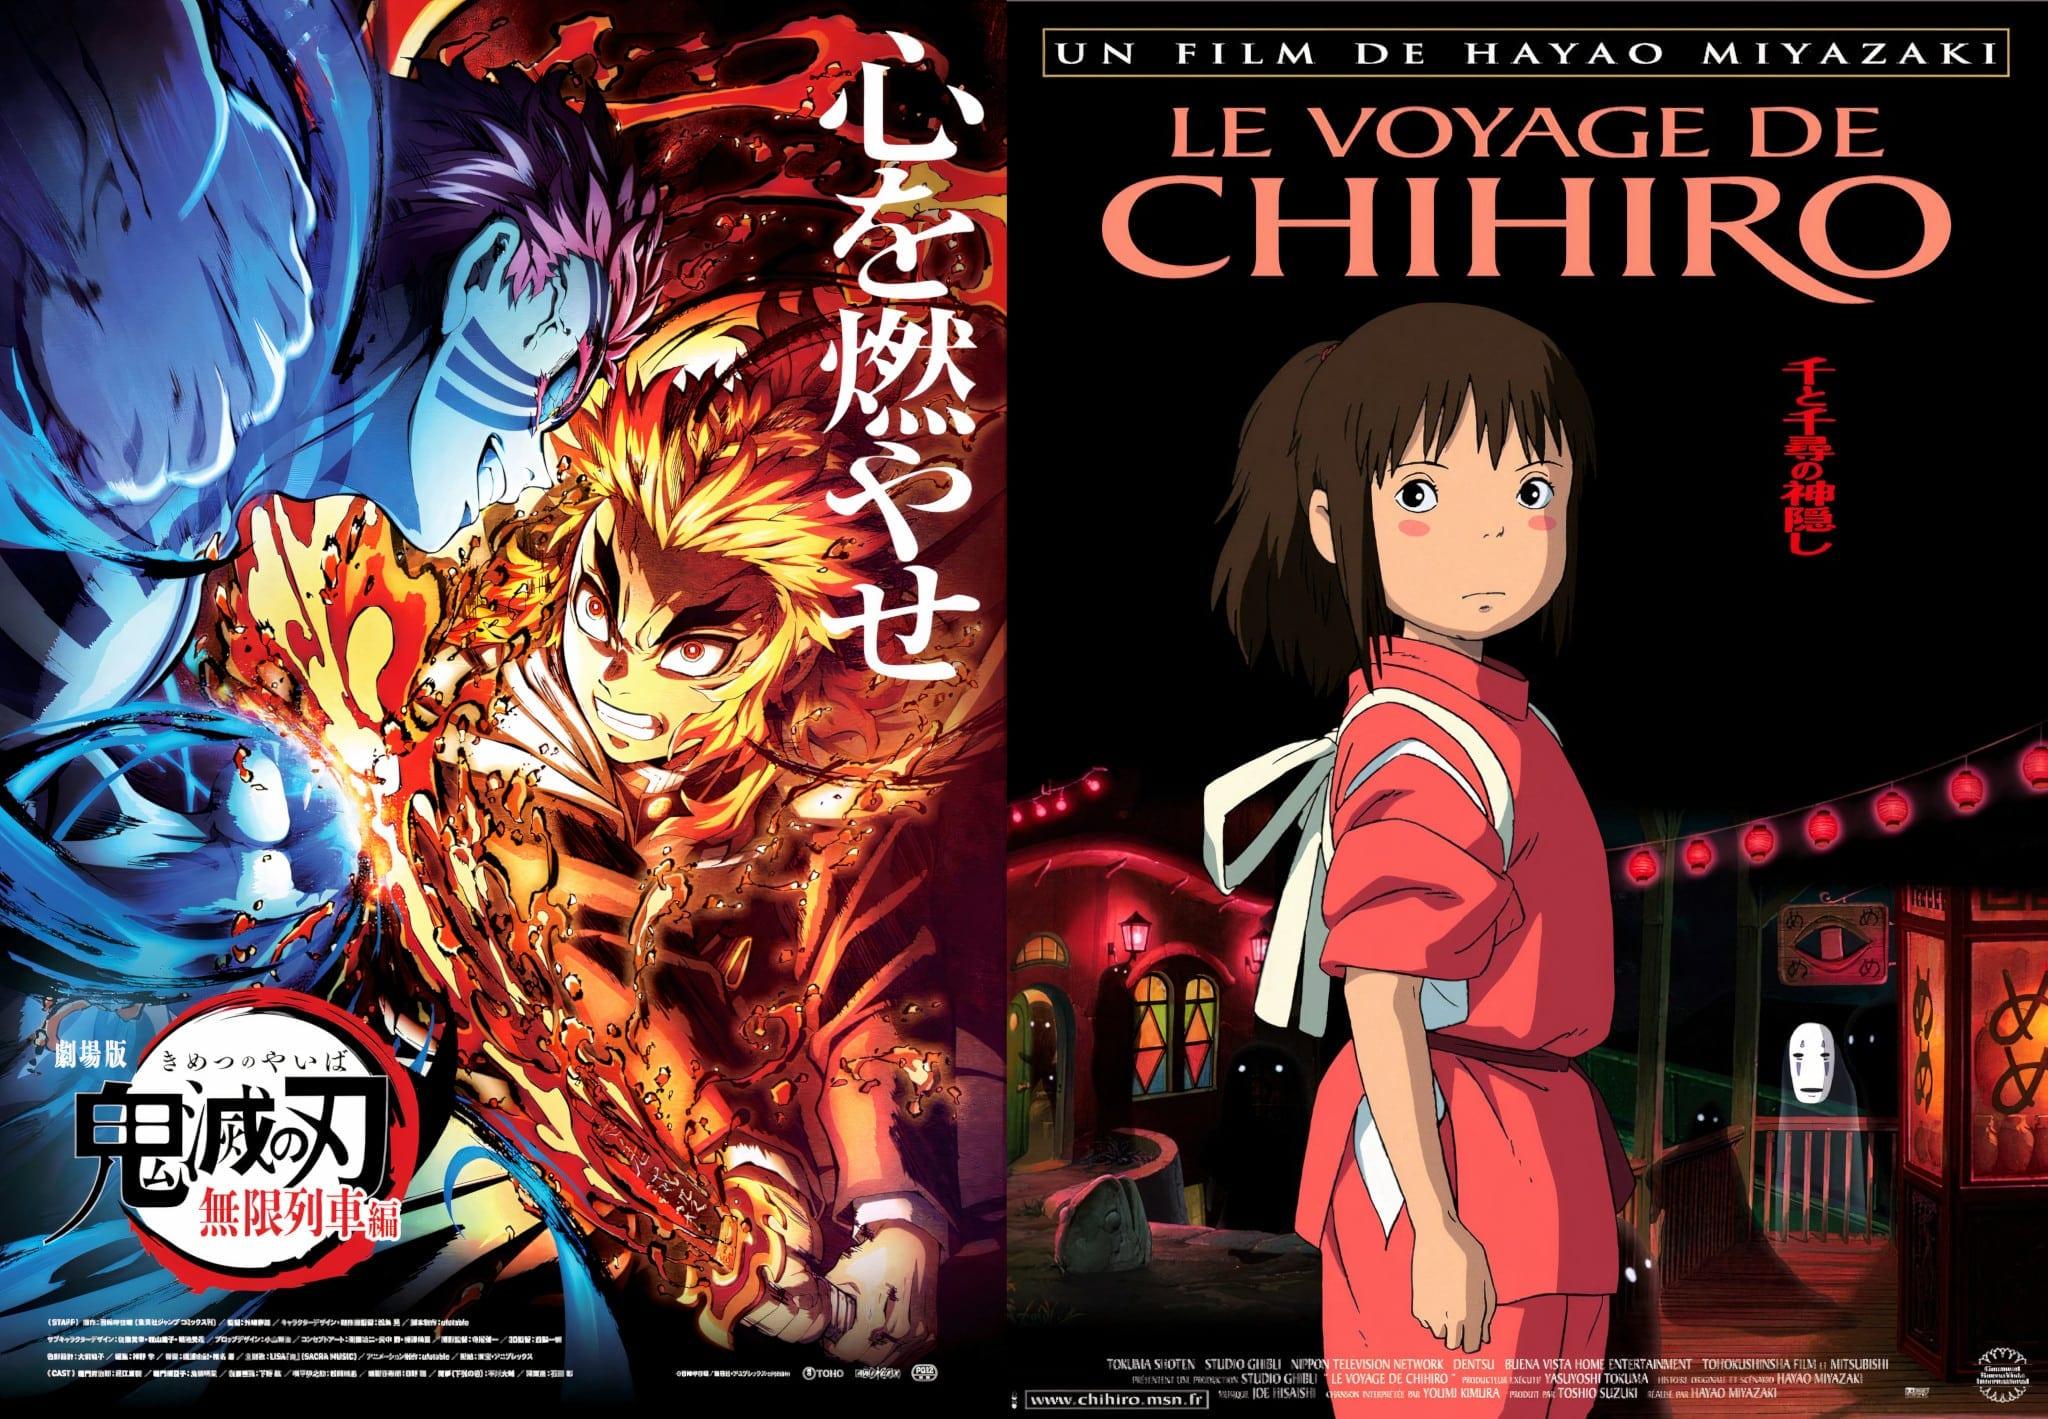 film demon slayer voyage de chihiro